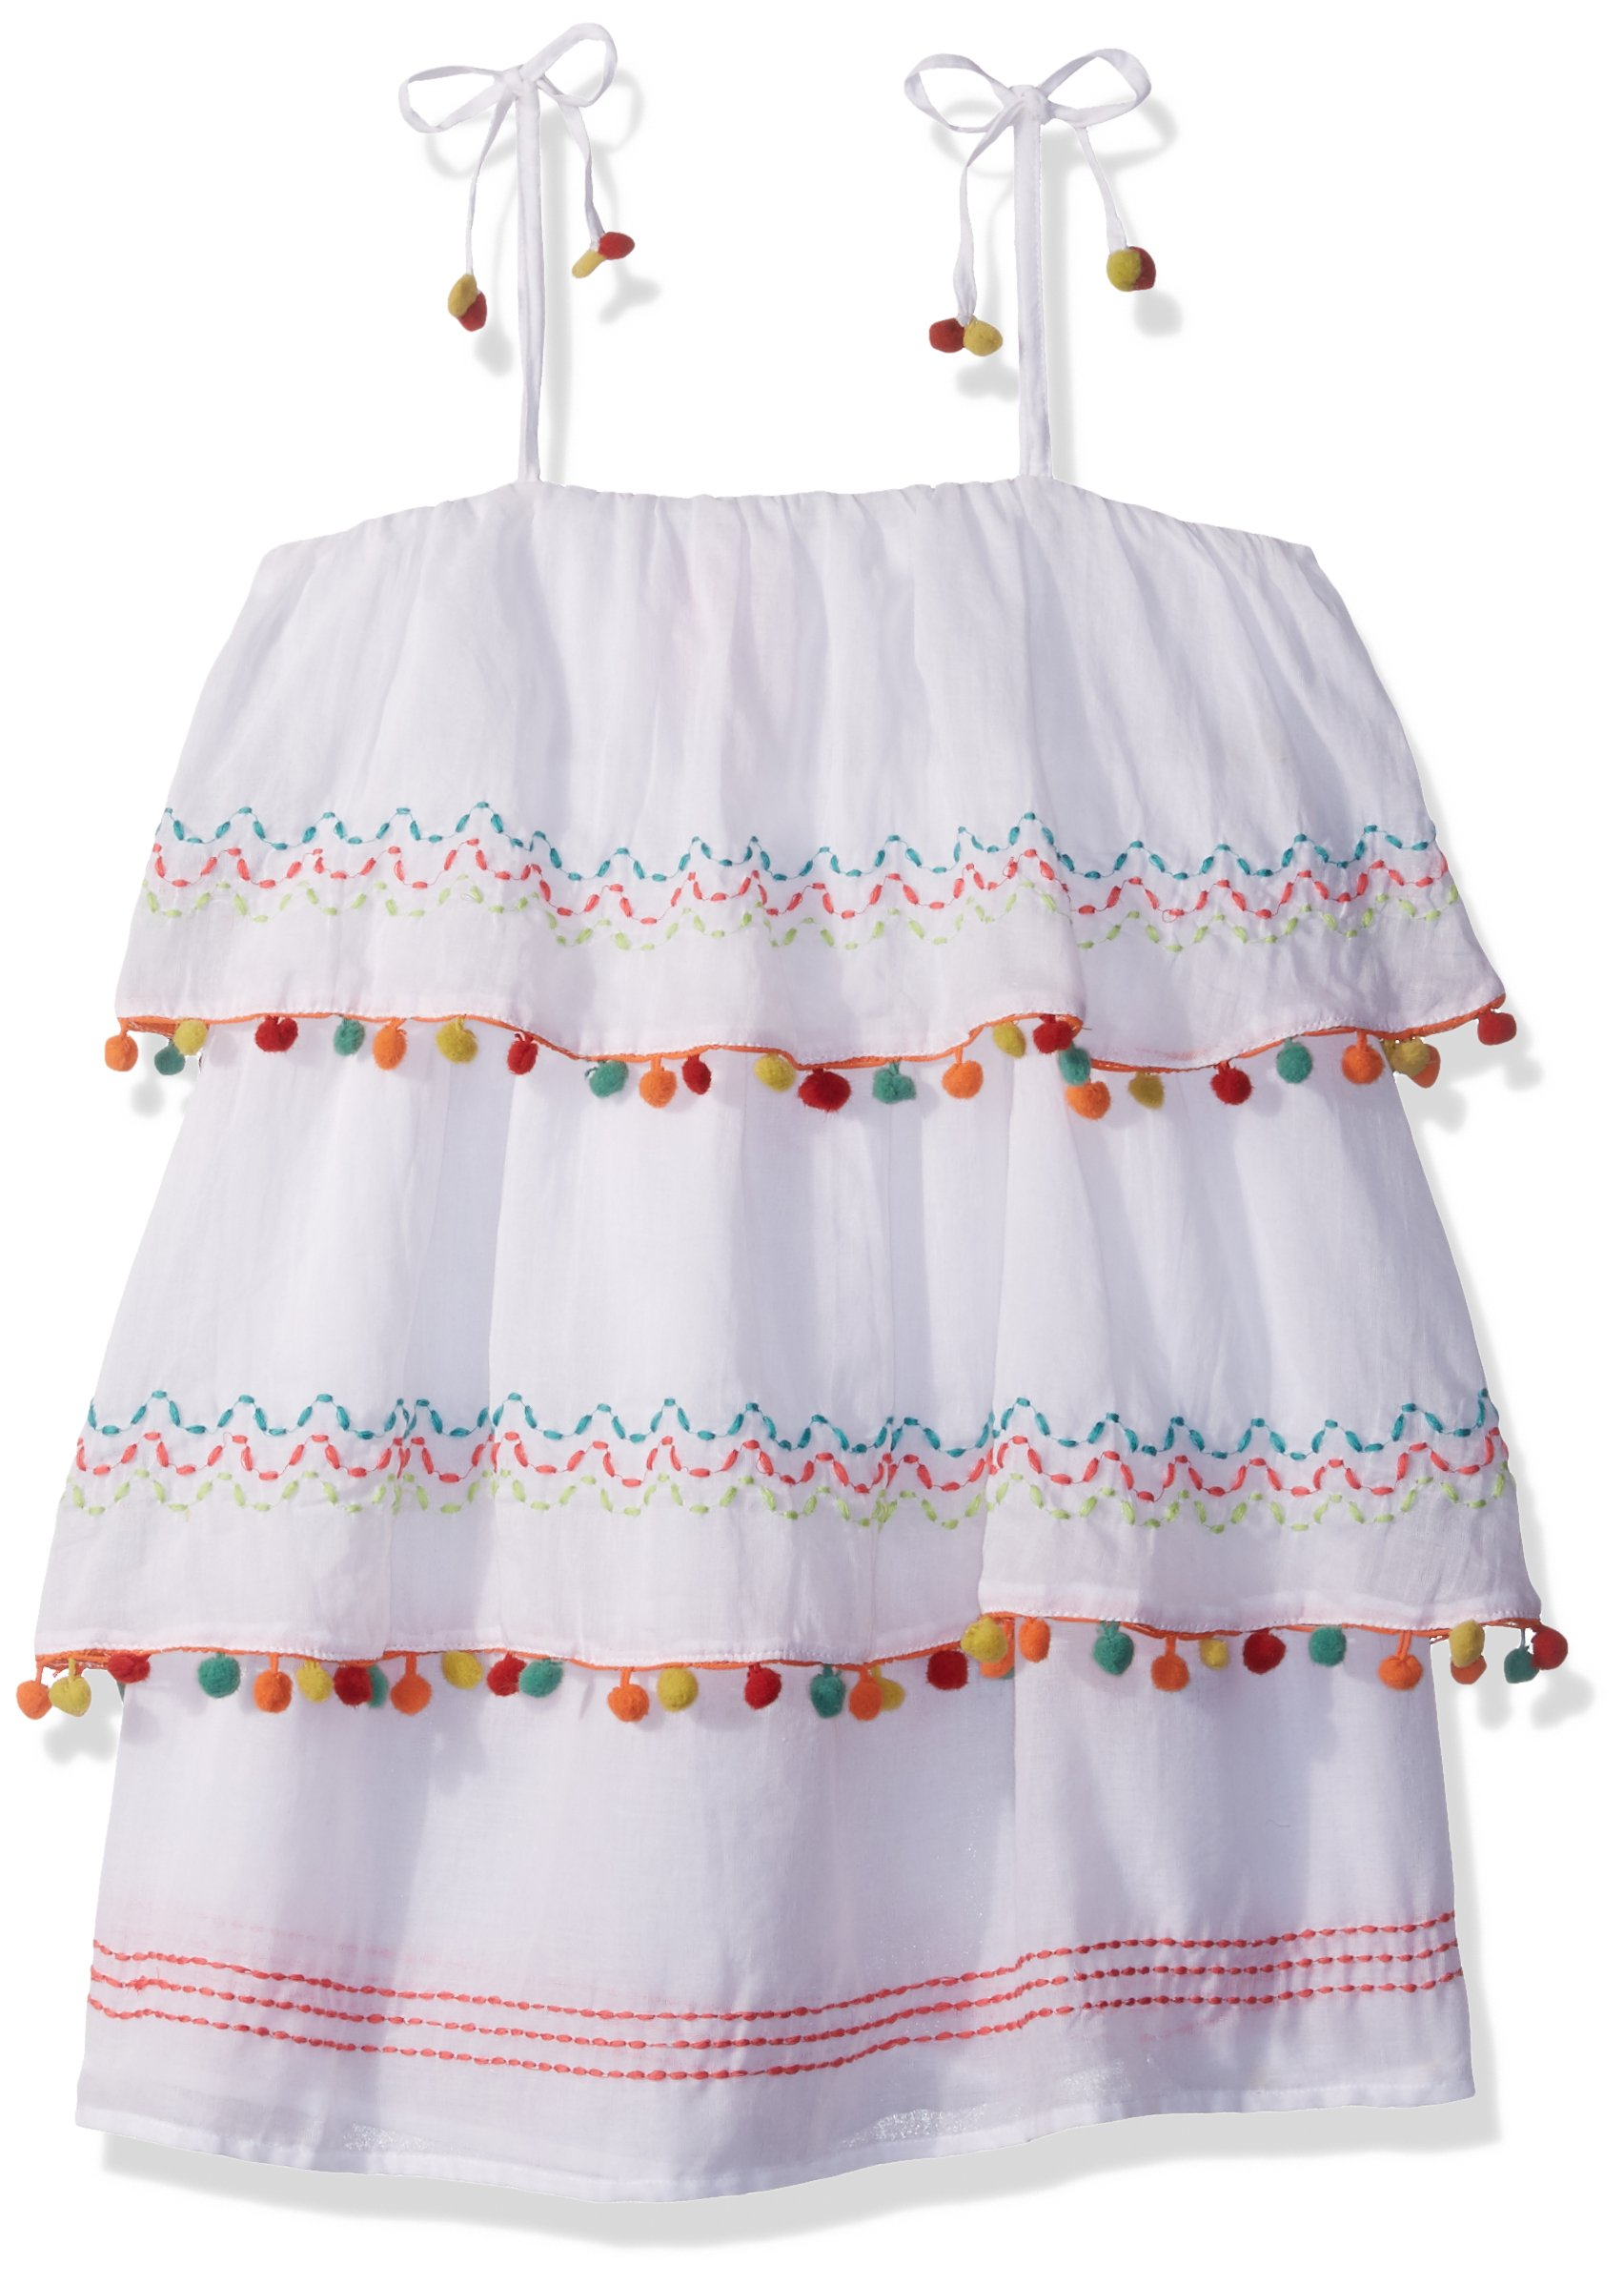 OndadeMar Little Girls' Short Dress Cover-up, Amazonia, 4